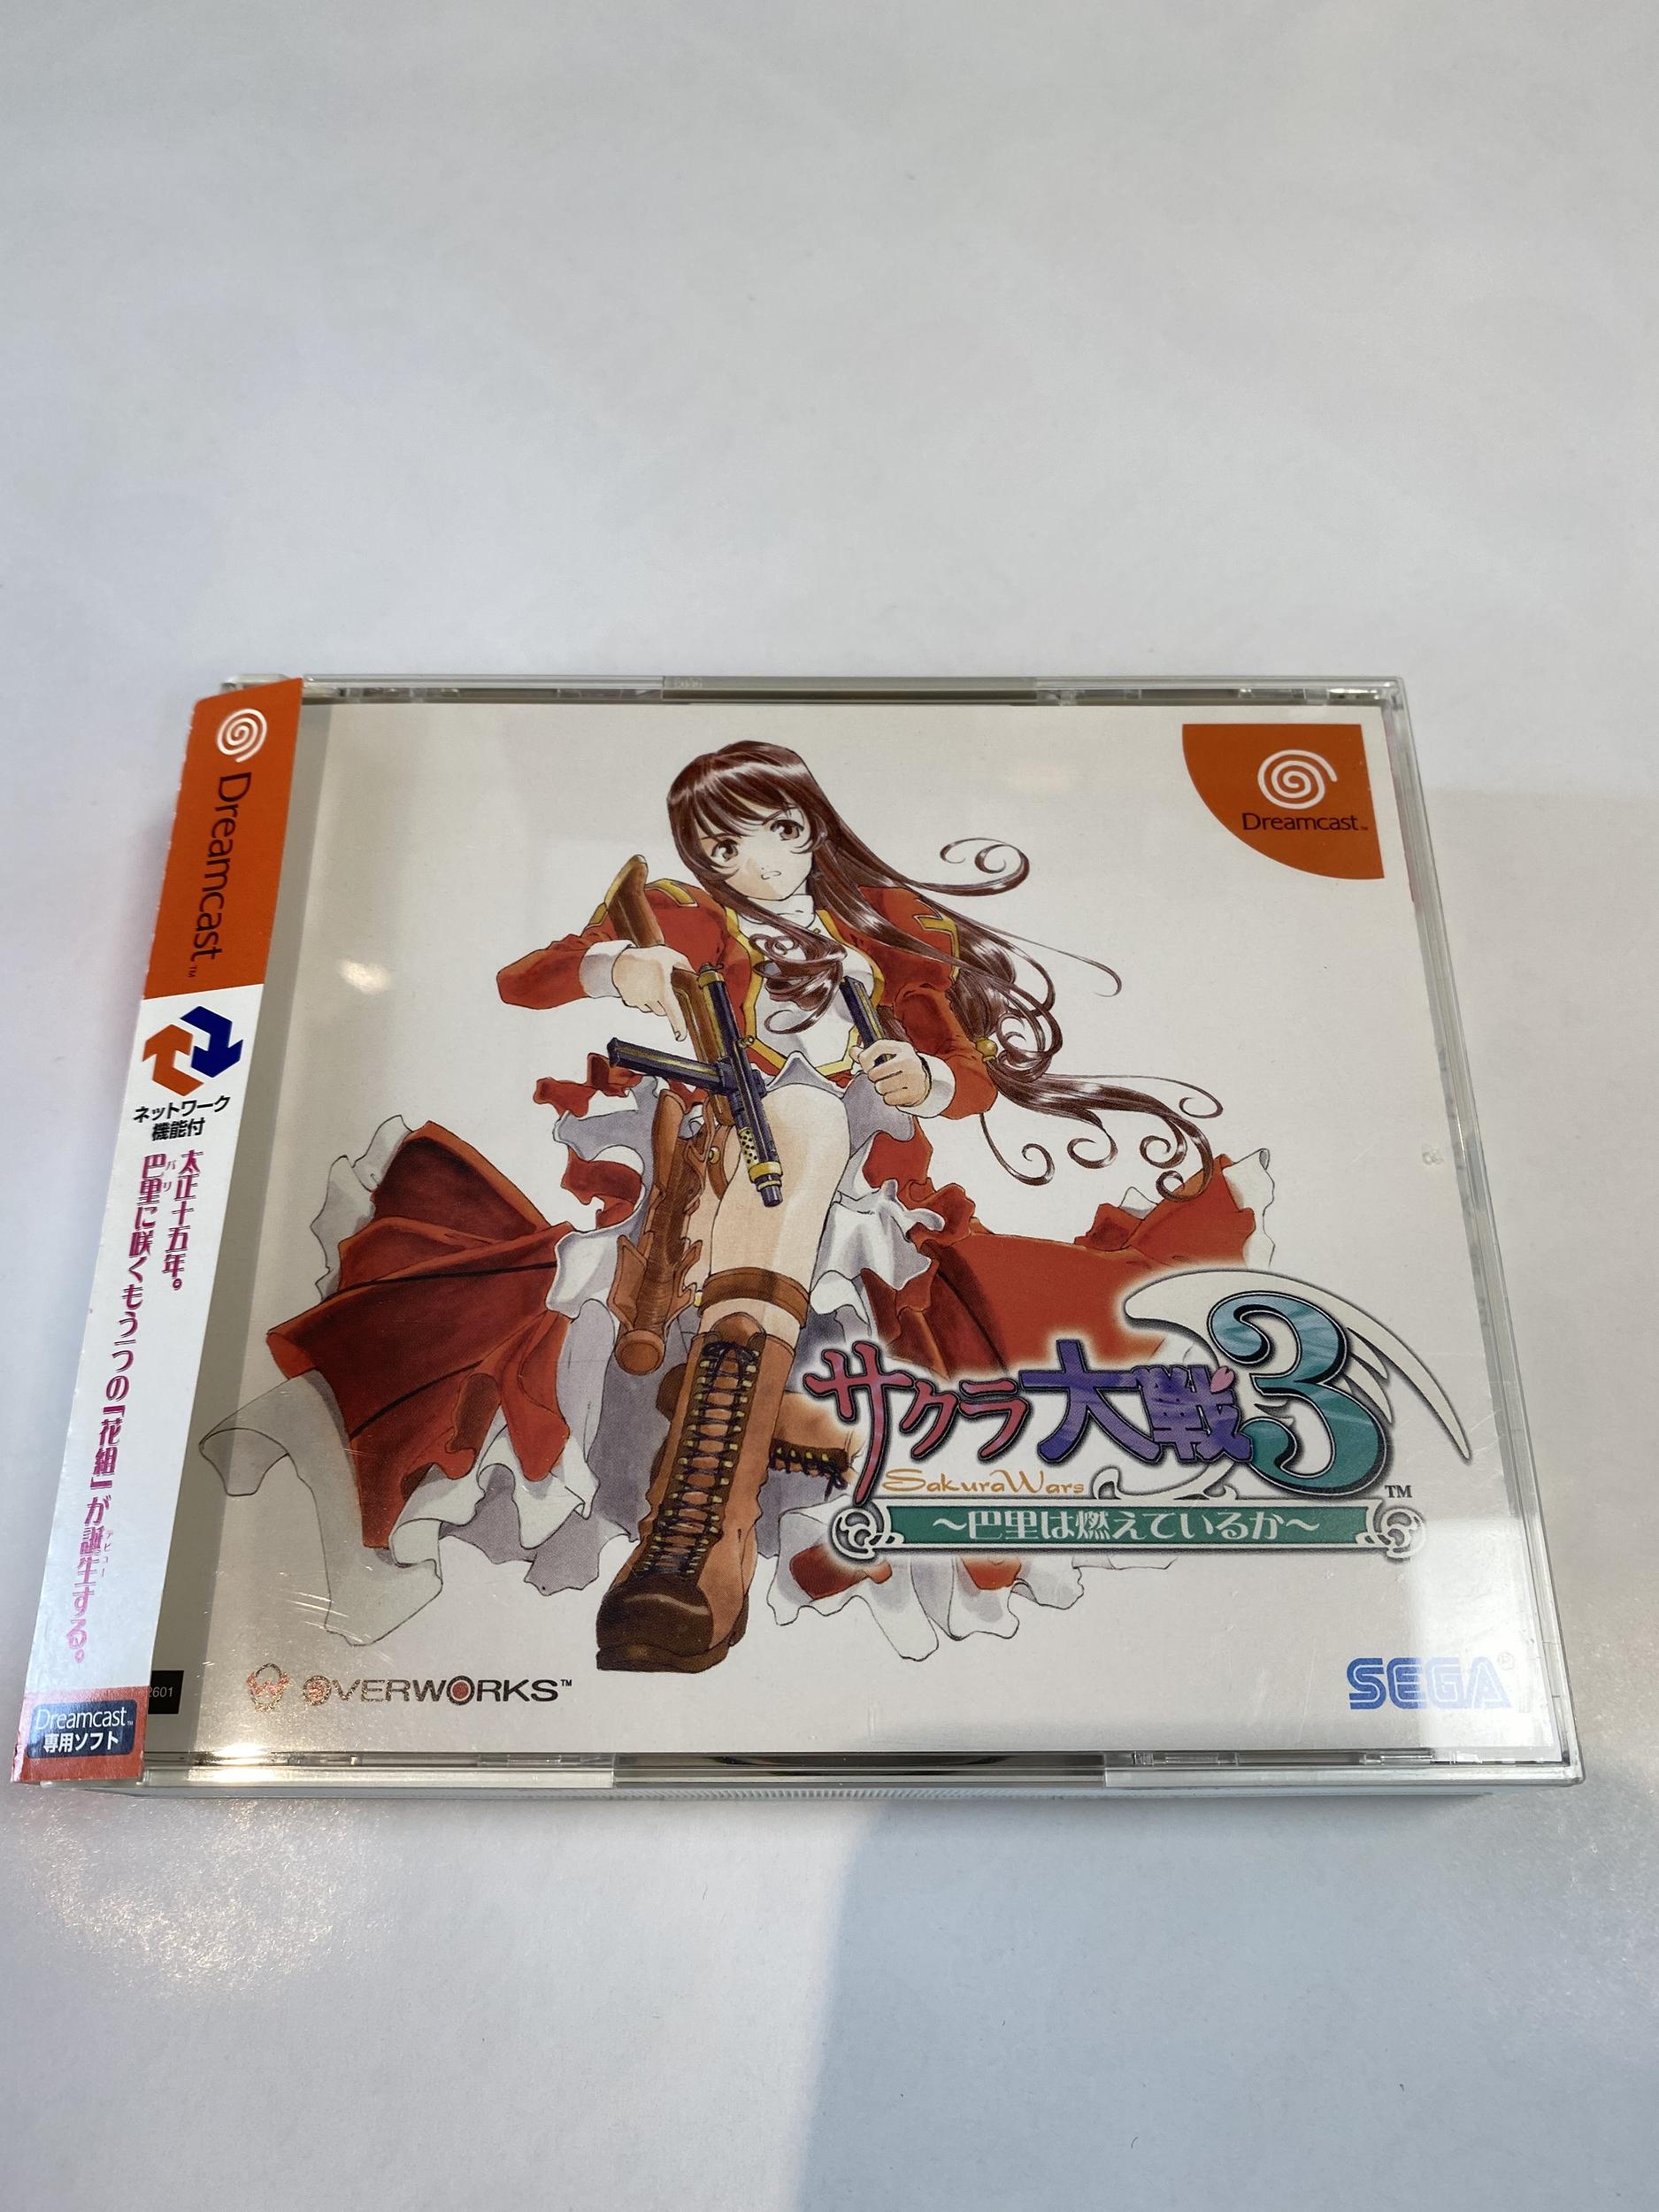 Sakura Wars 3 (version japonaise) - Dreamcast